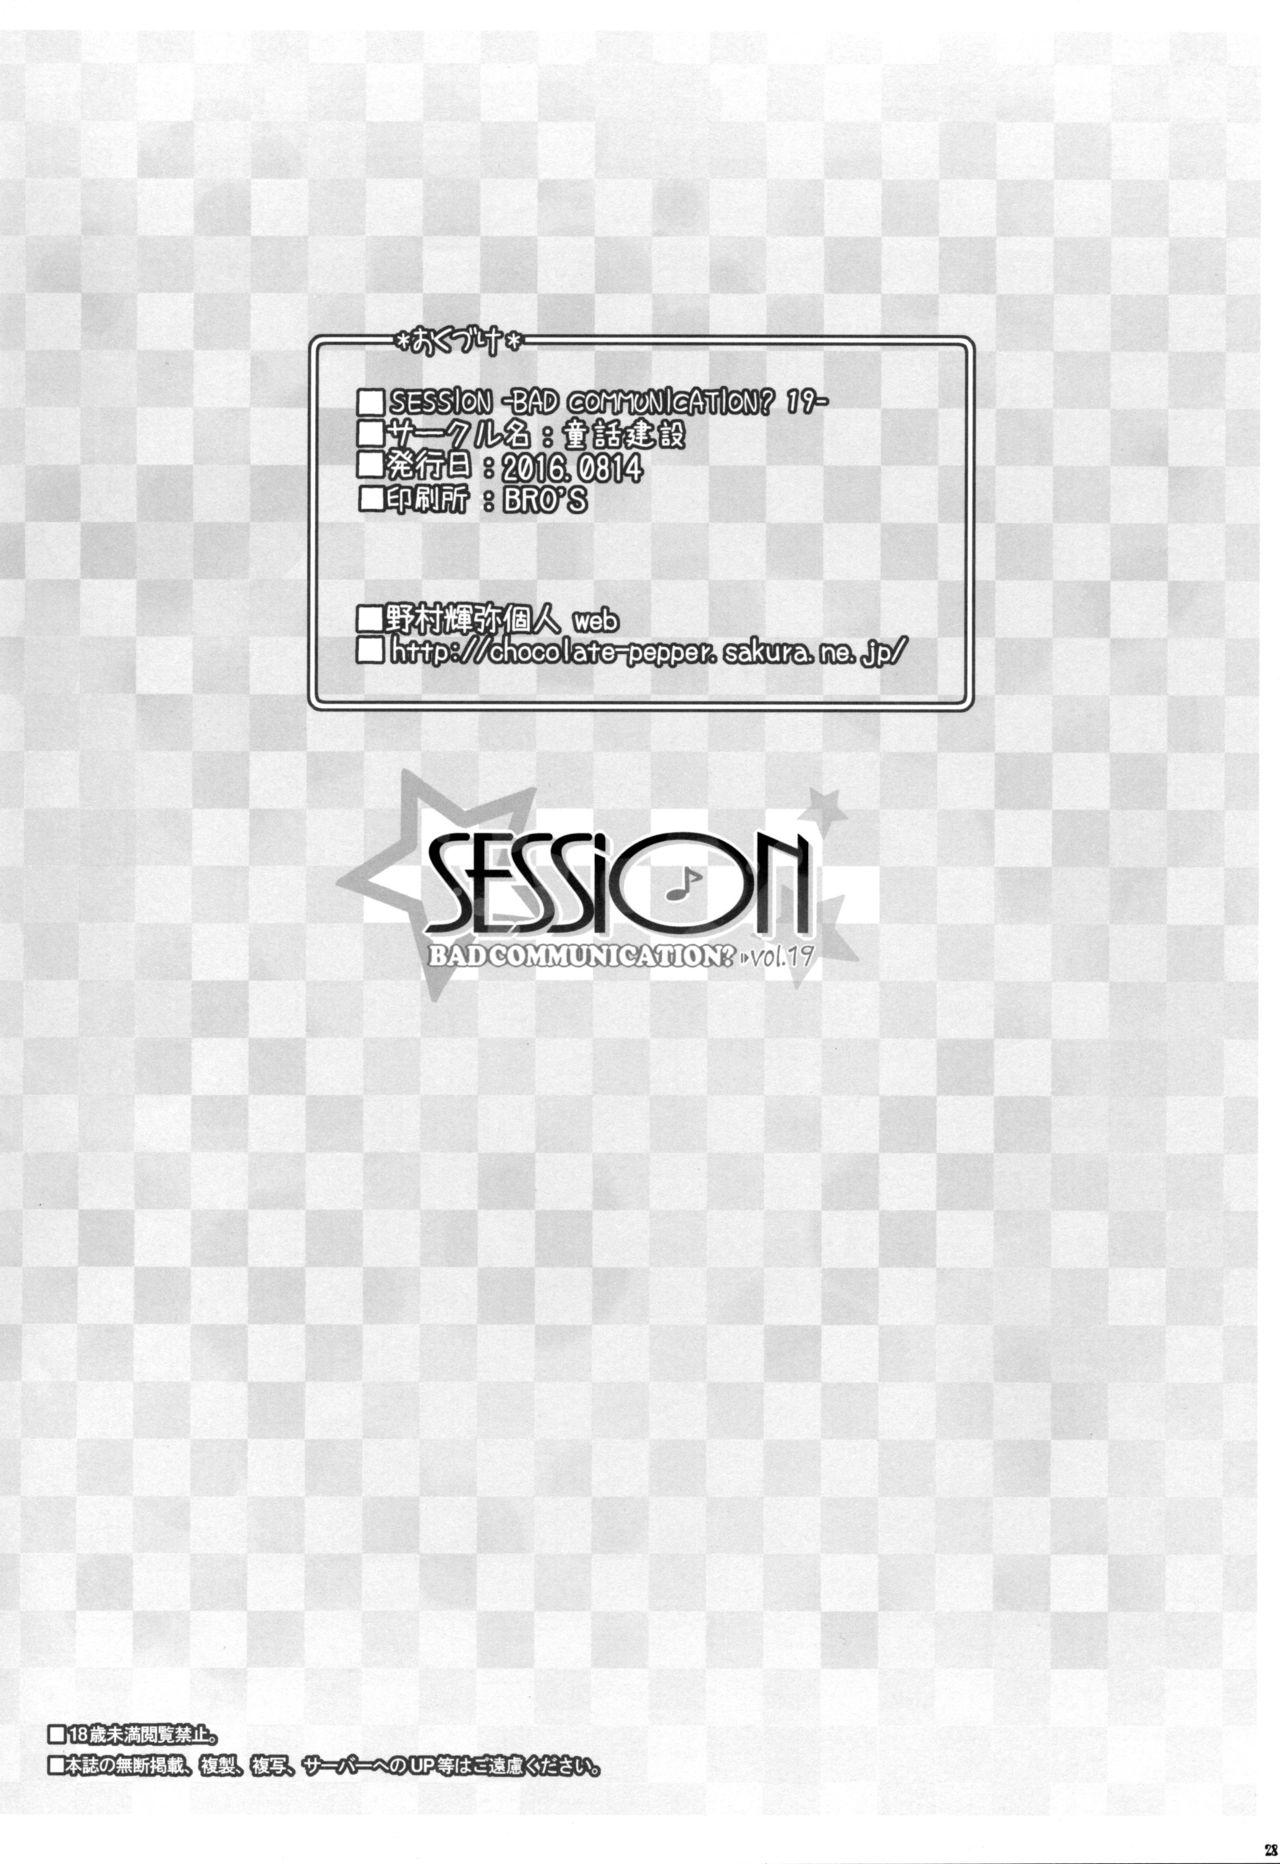 SESSION 27